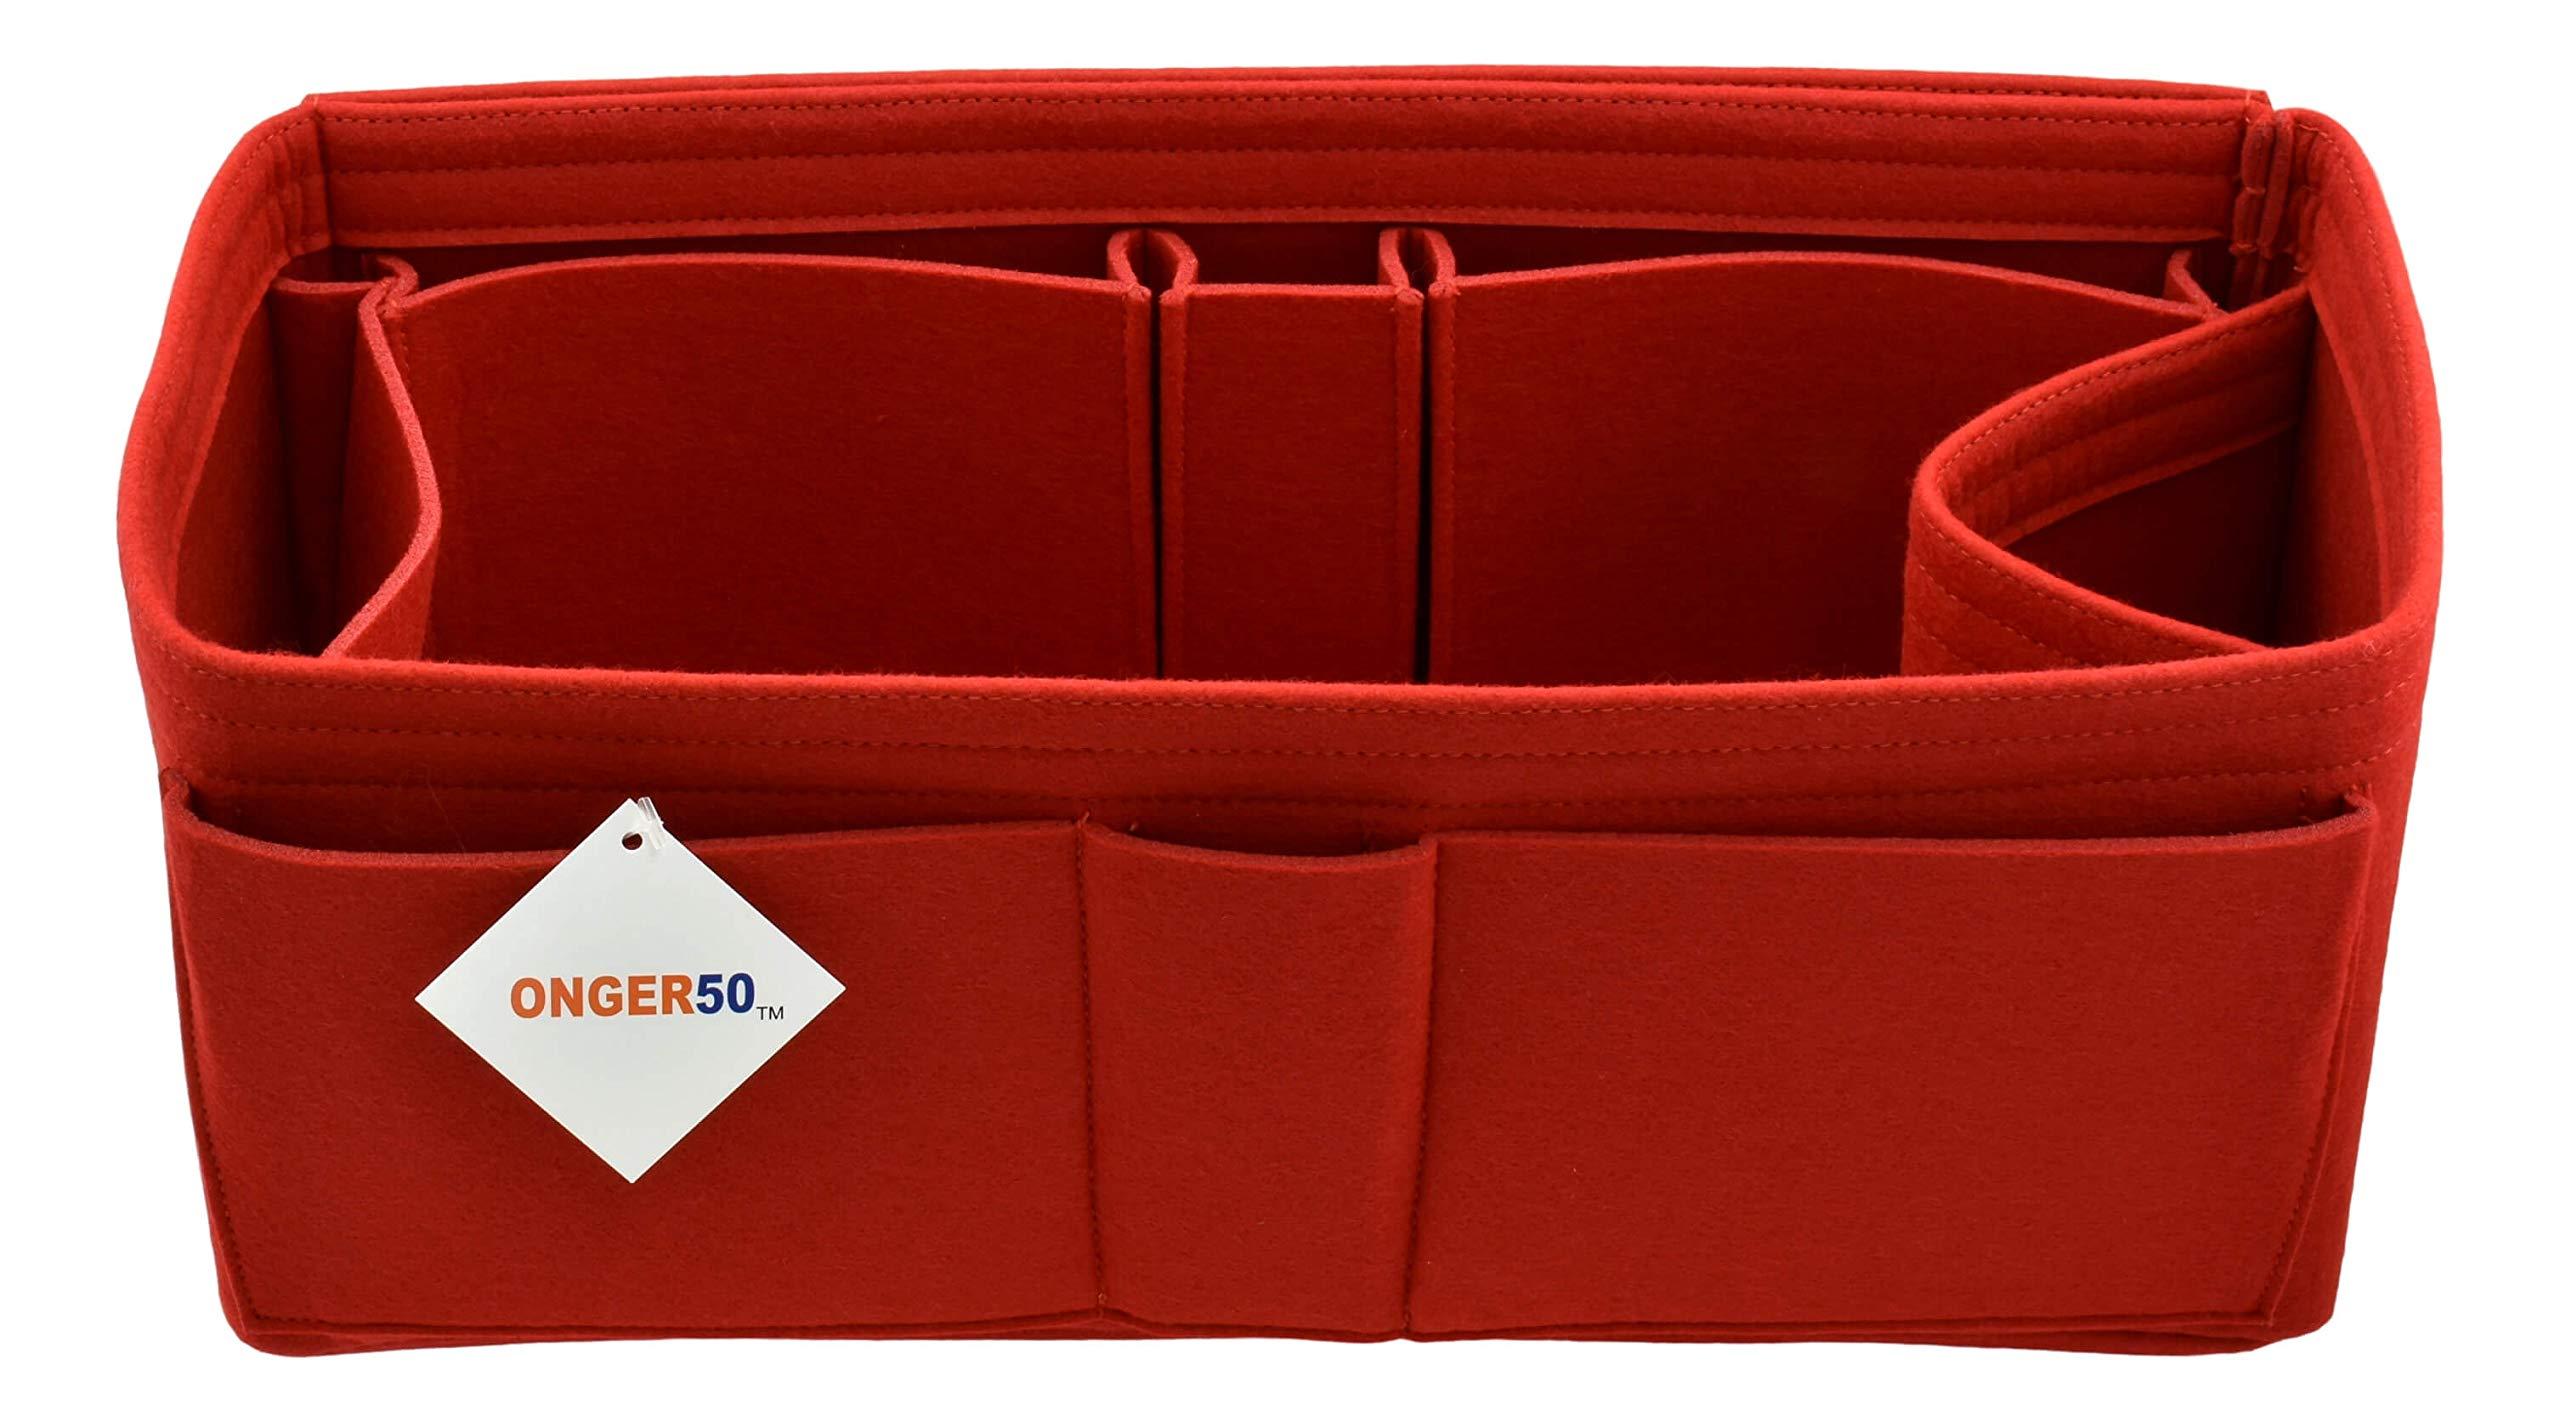 Felt Purse Handbag Tote Organizer Insert - Multi Pocket Storage Liner & Shaper (X-Large, Red)